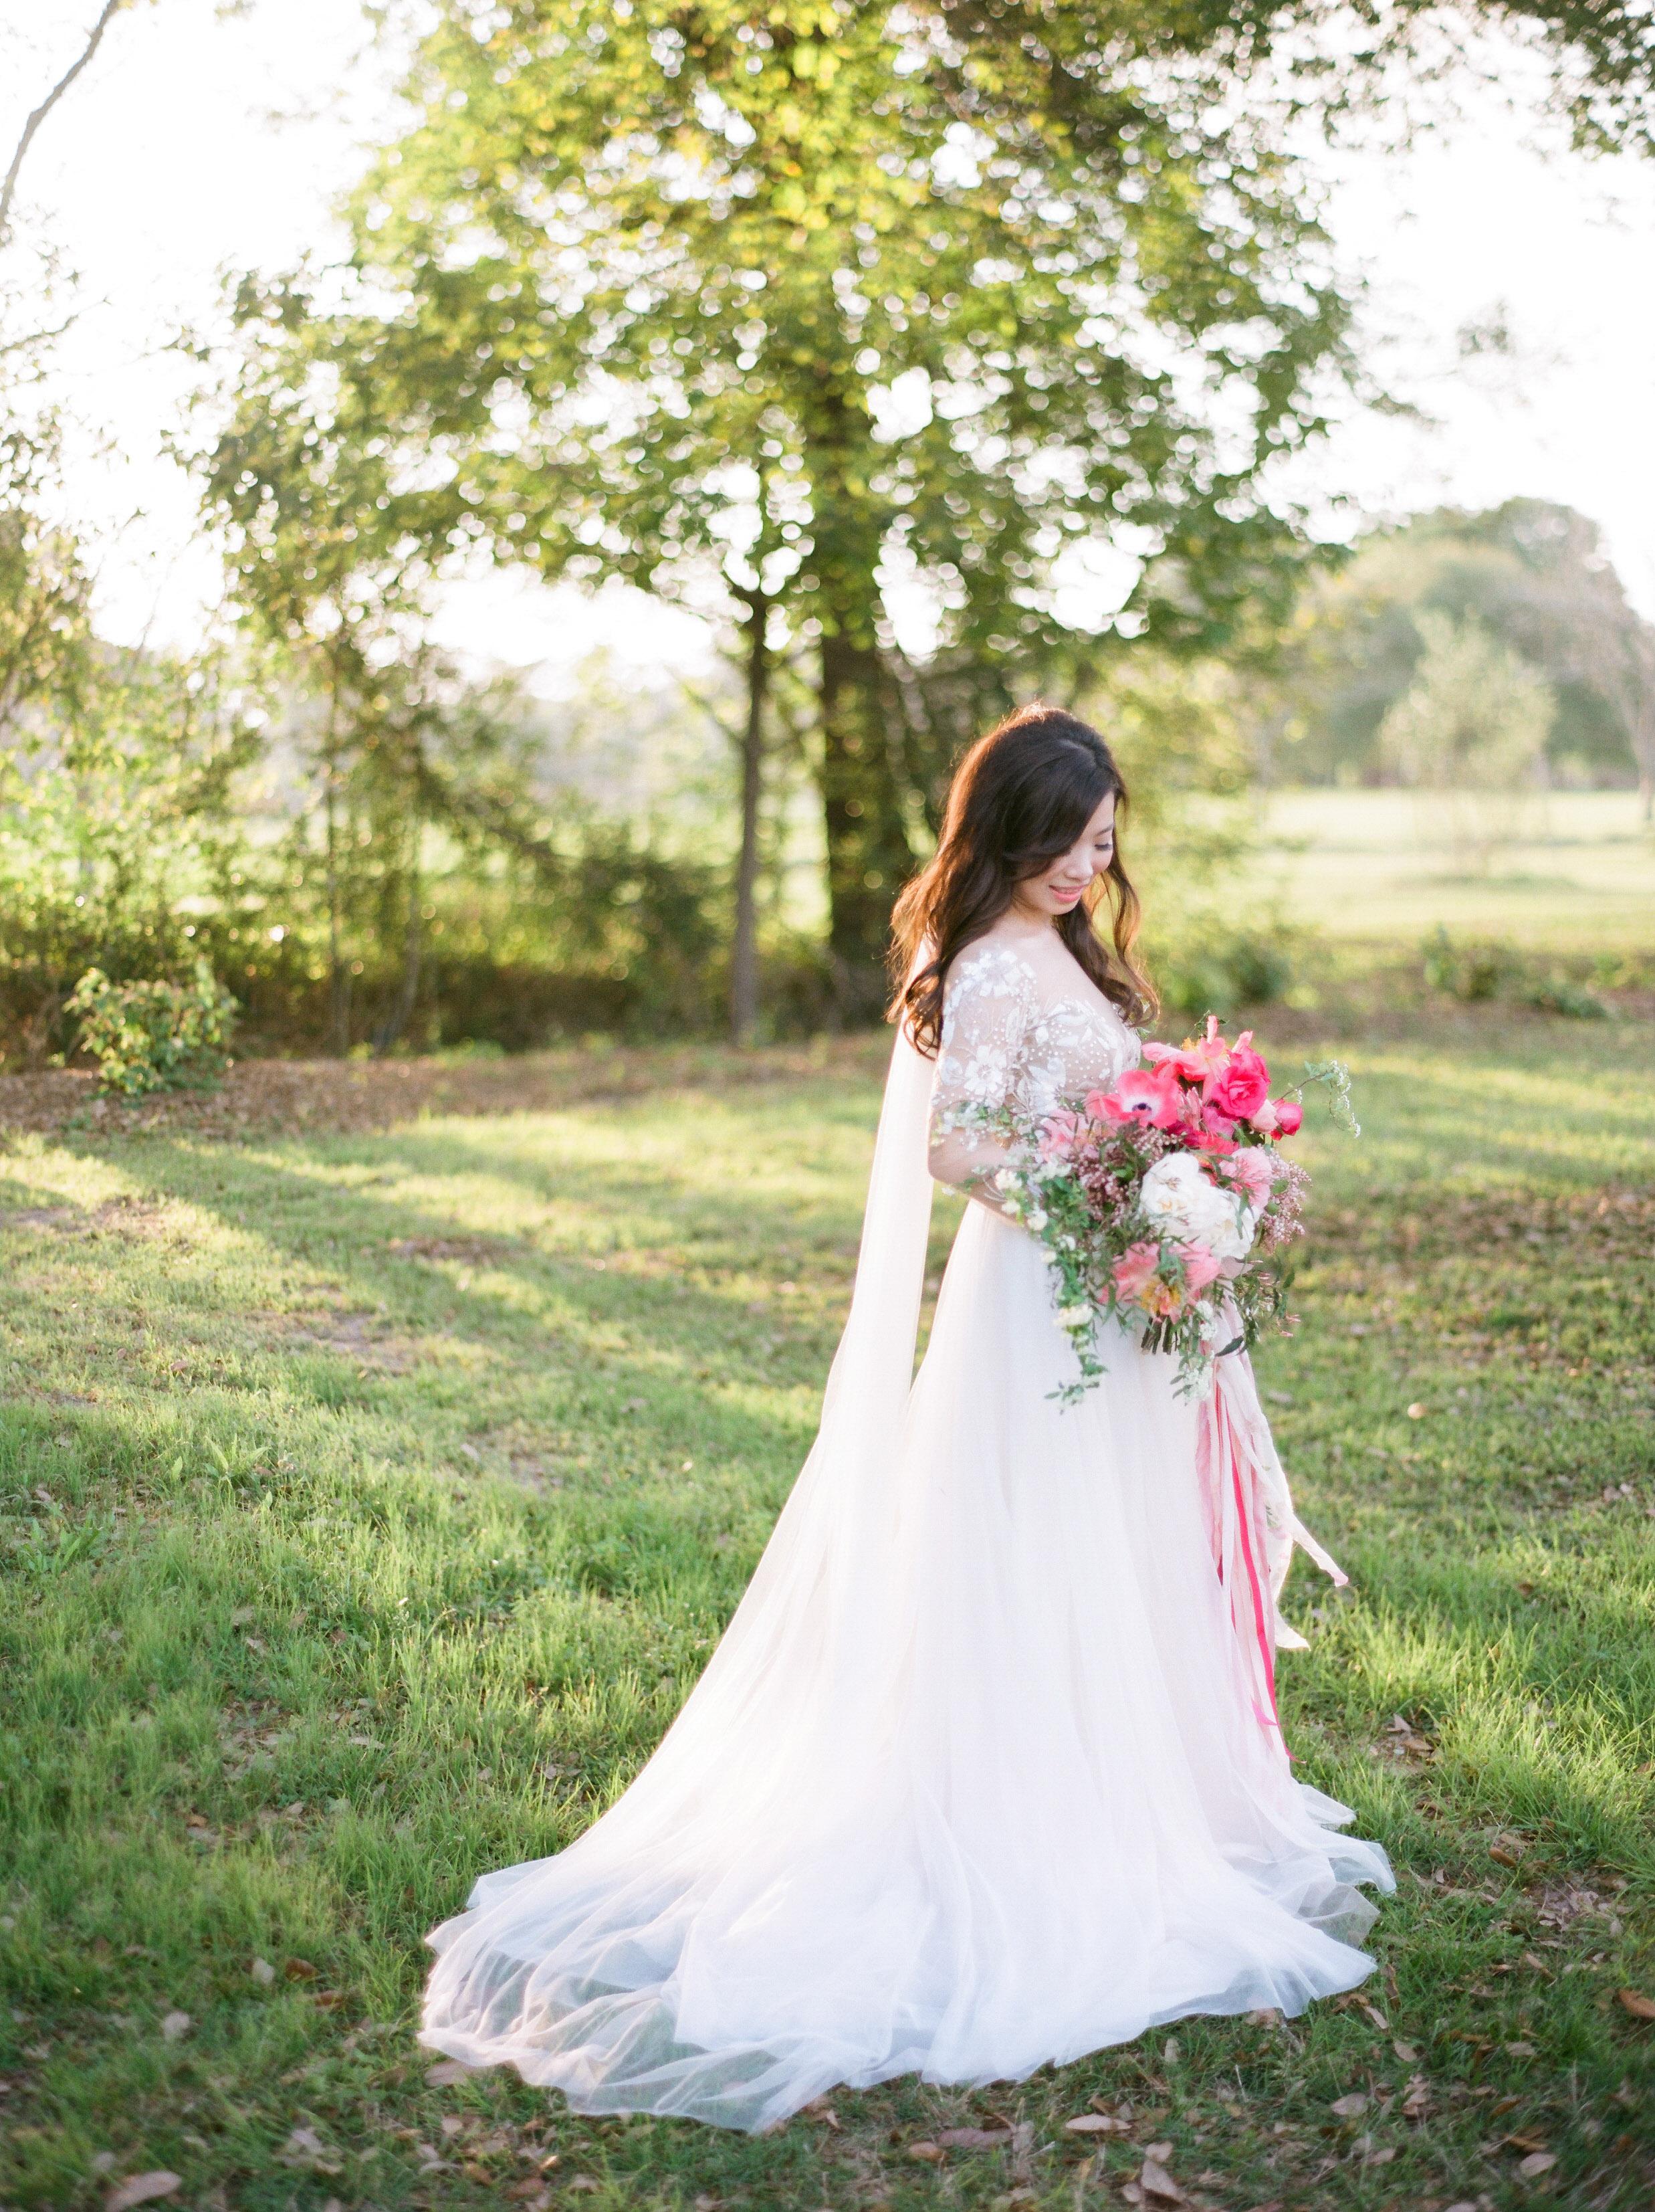 The-Knot-50-Weddings-50-States-Texas-Winner-Dana-Fernandez-photography-houston-wedding-photographer-film-fine-art-destination-14.jpg